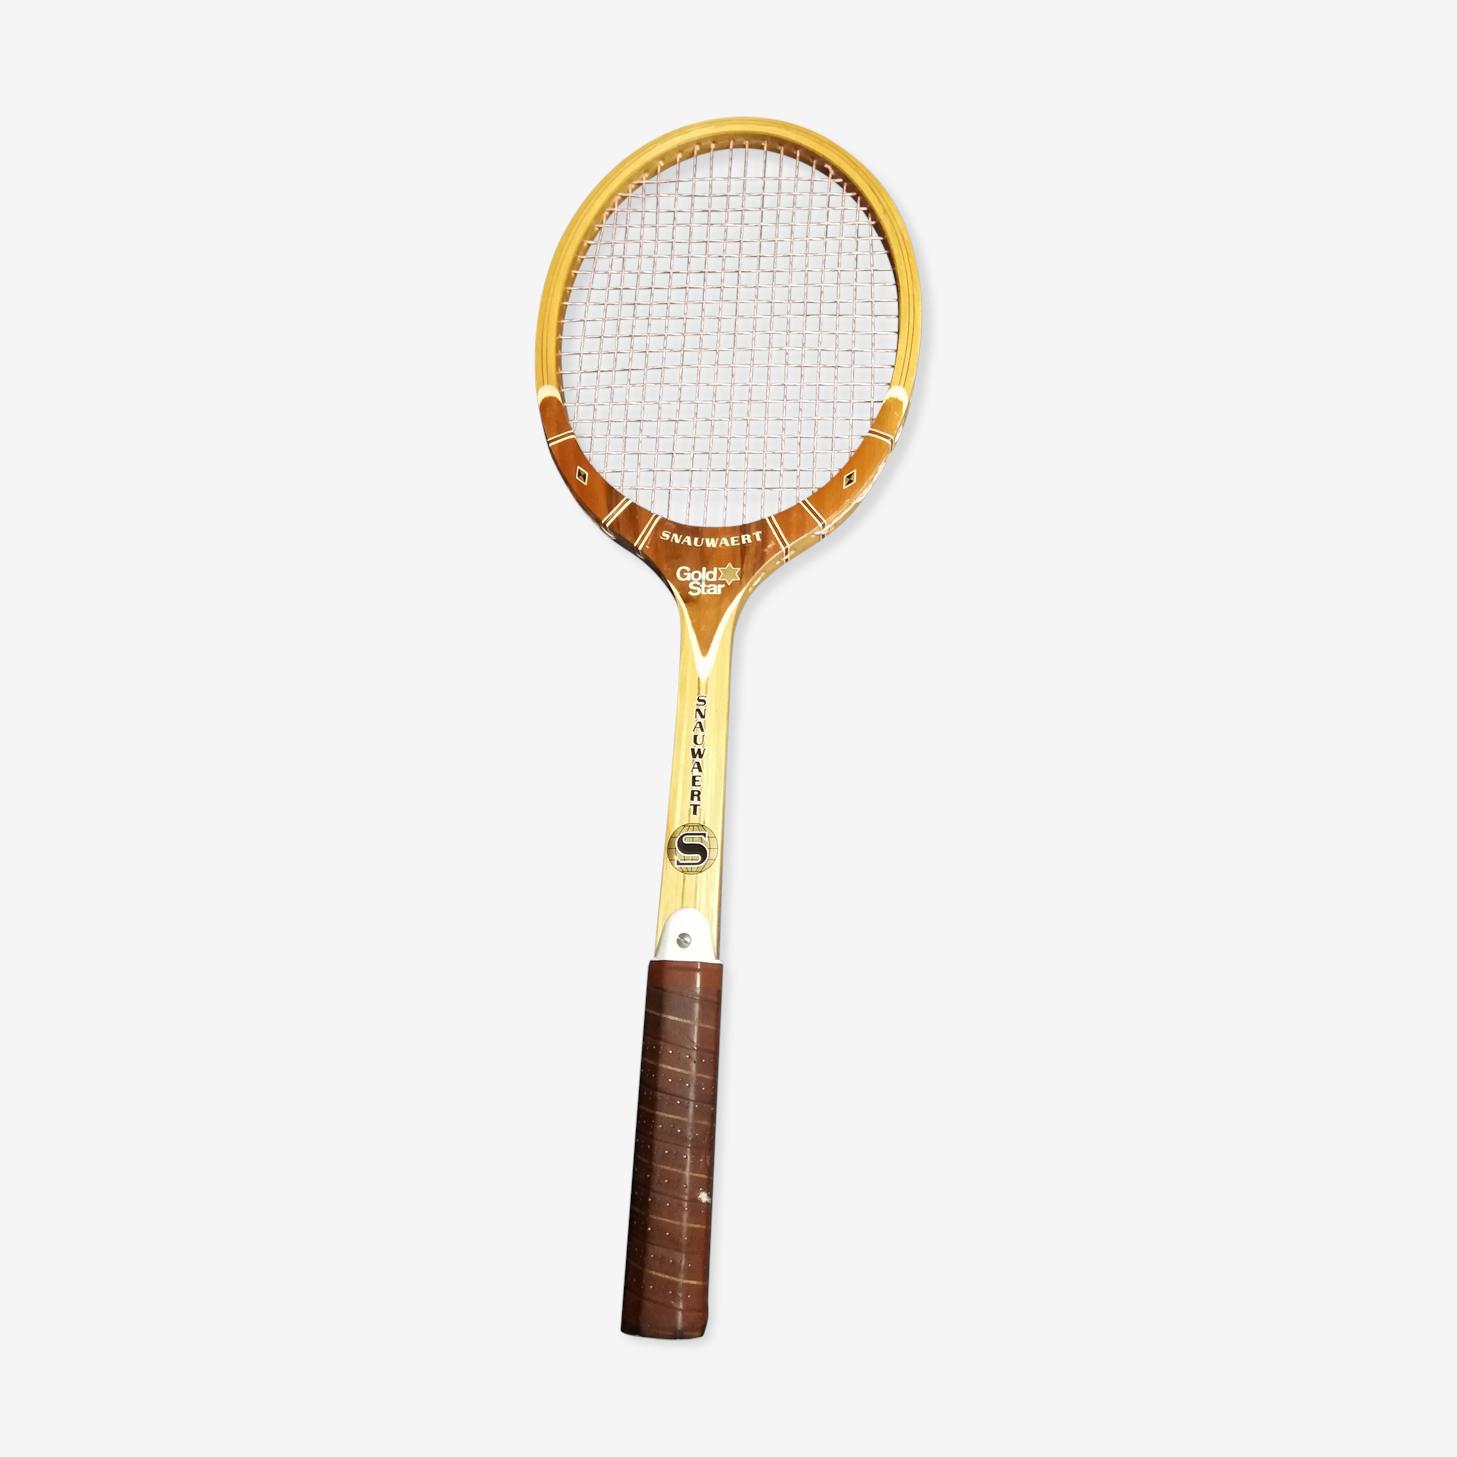 Raquette de tennis vintage Snauwaert Depla